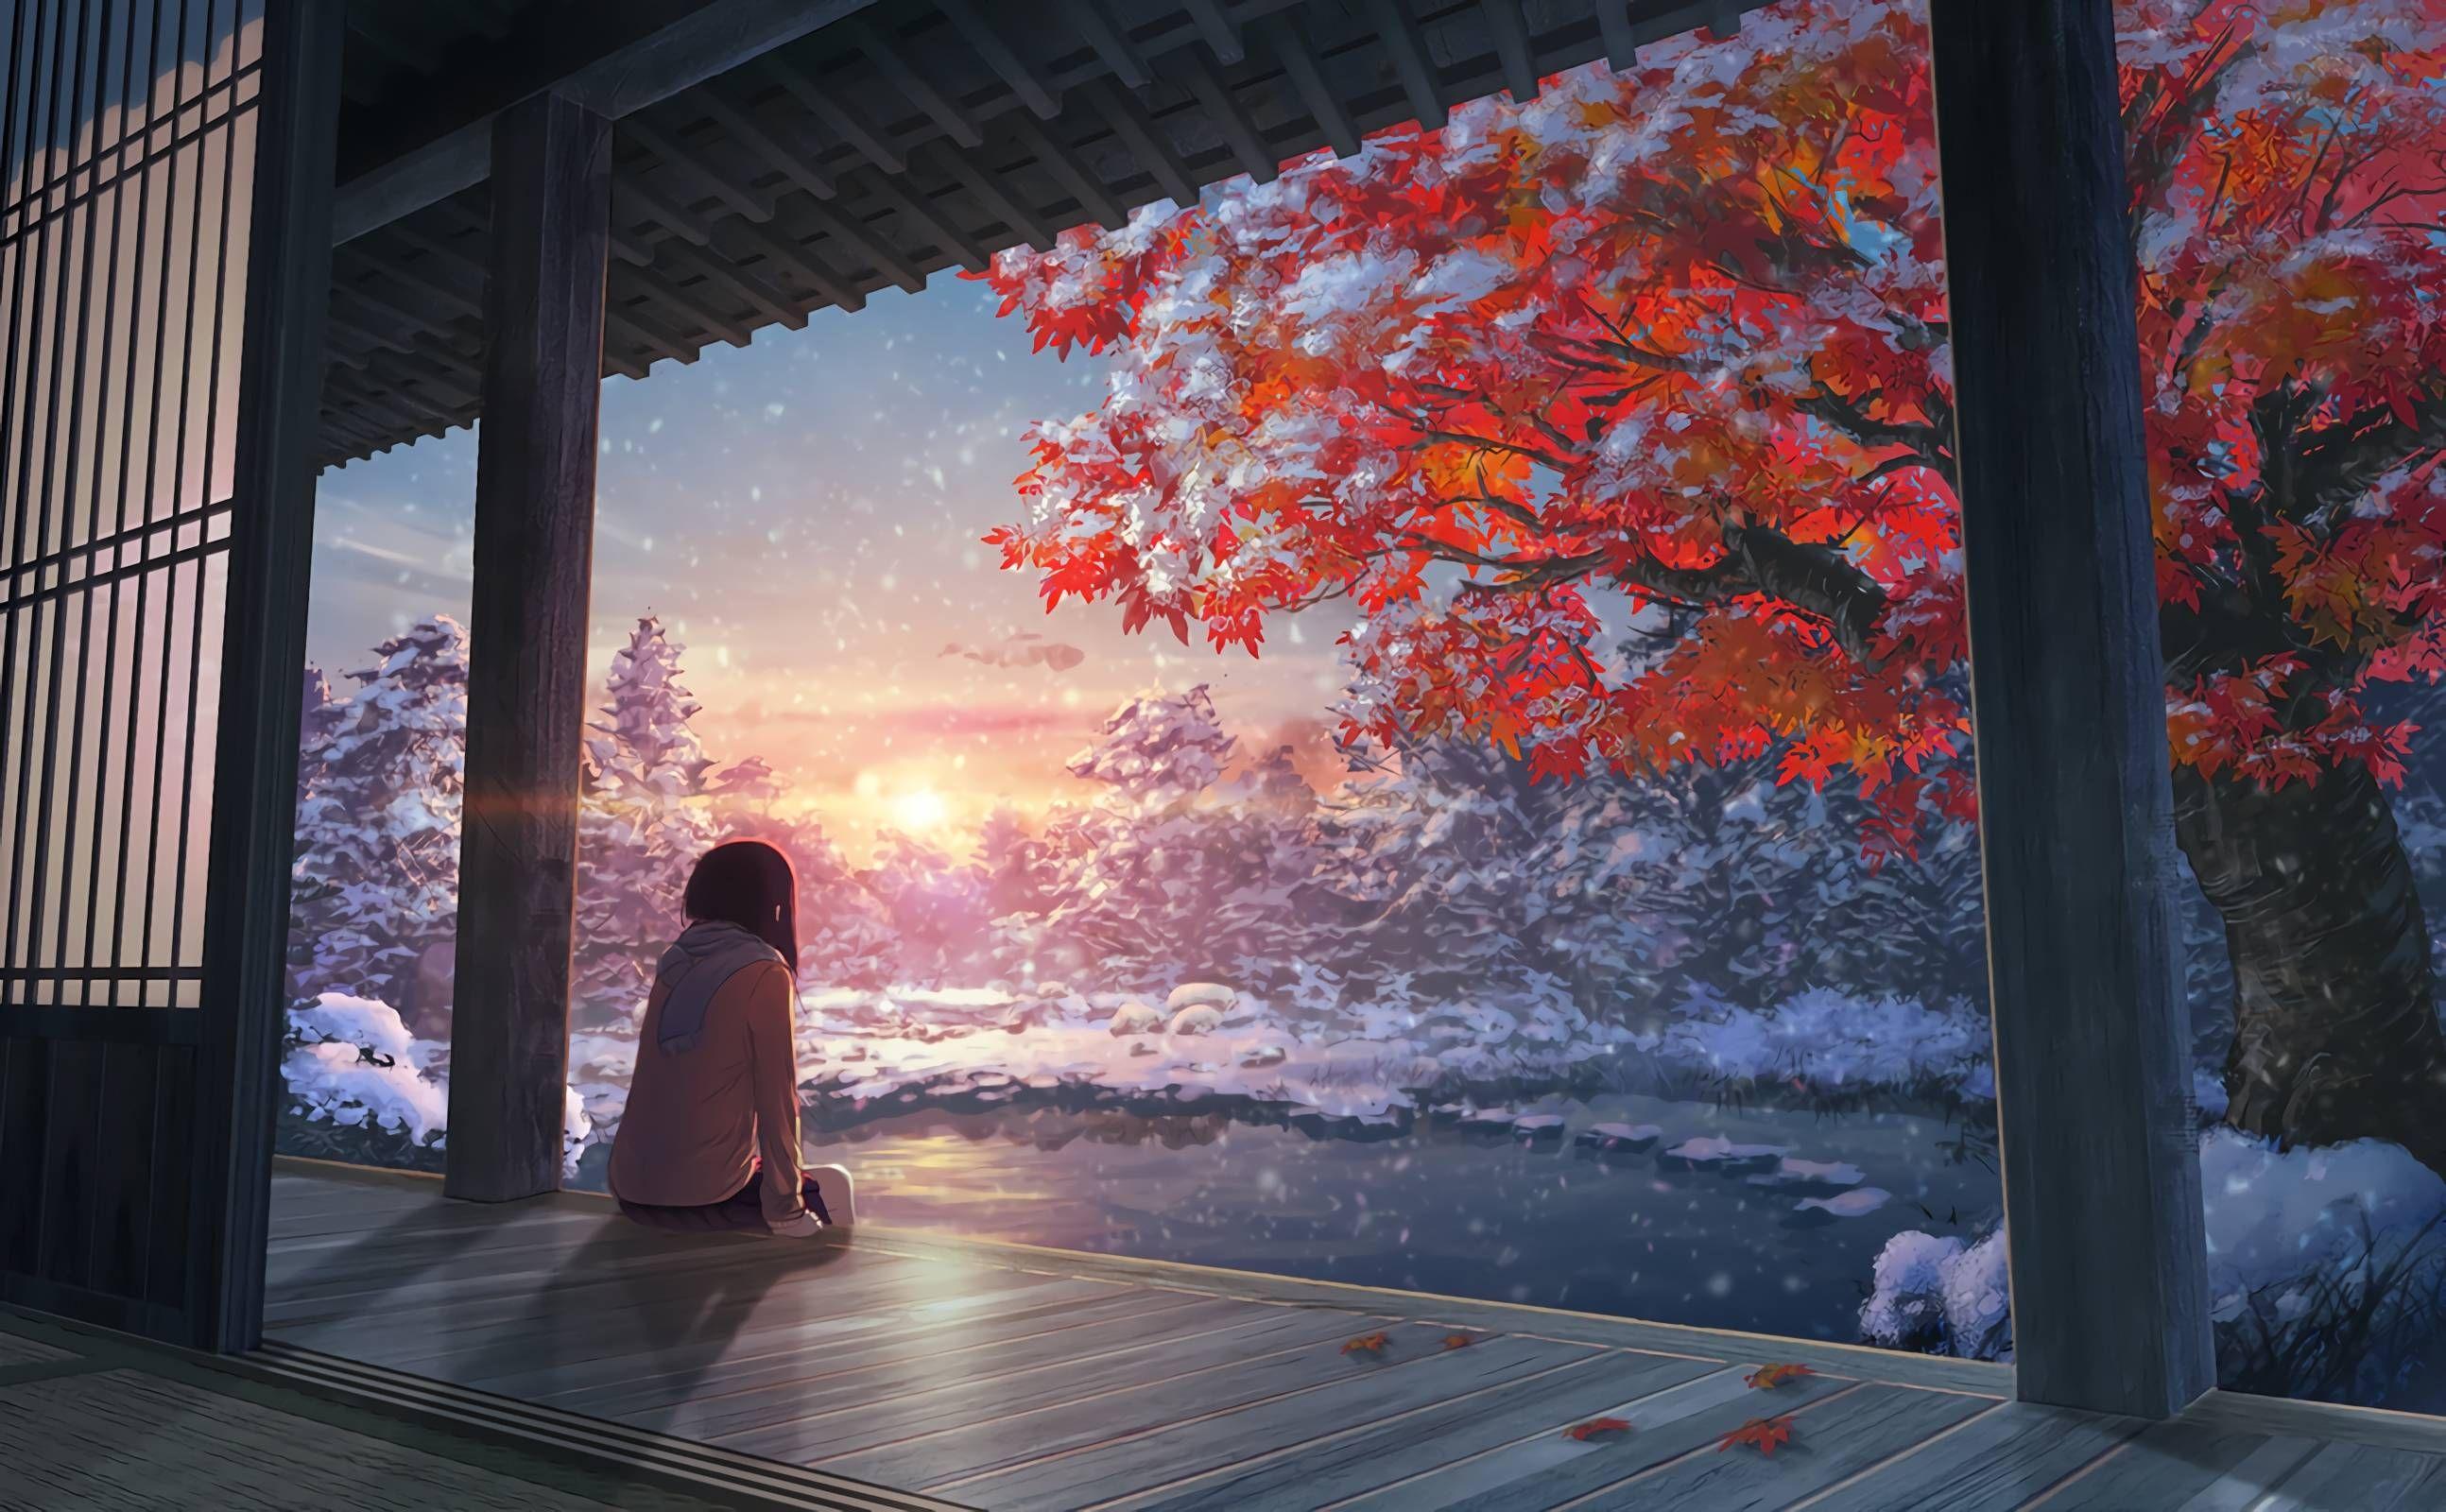 ddatmsh Anime scenery wallpaper, Anime background, Anime